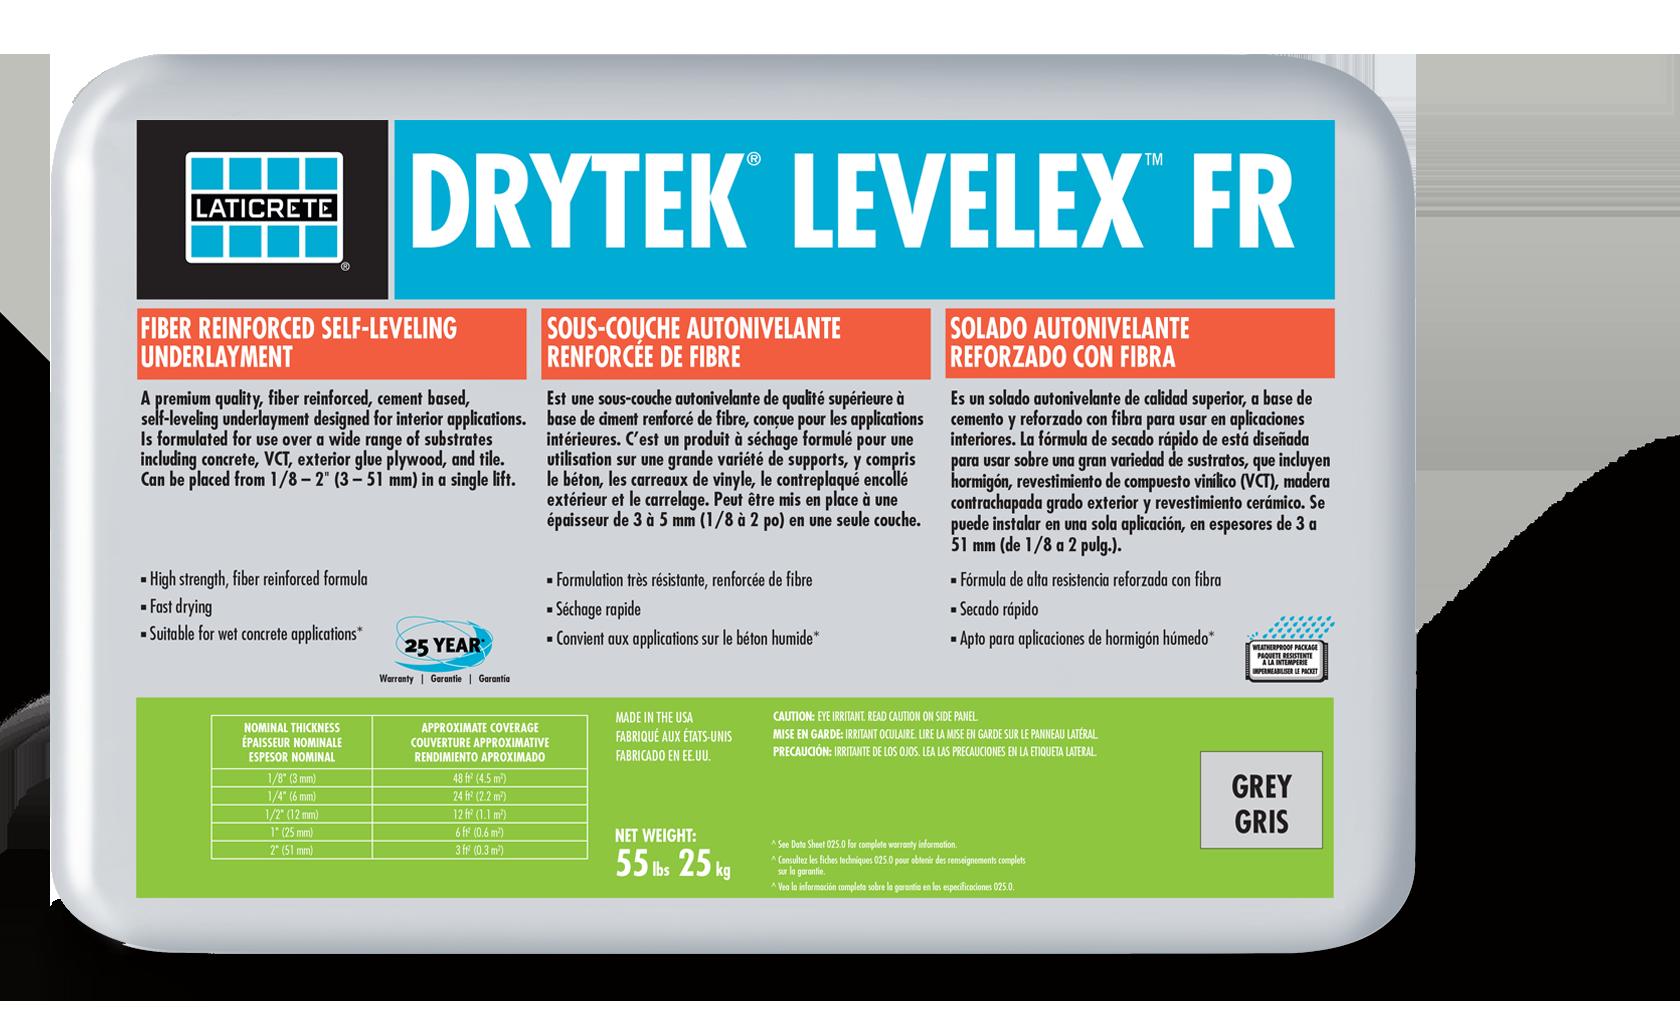 DRYTEK® LEVELEX™ FR